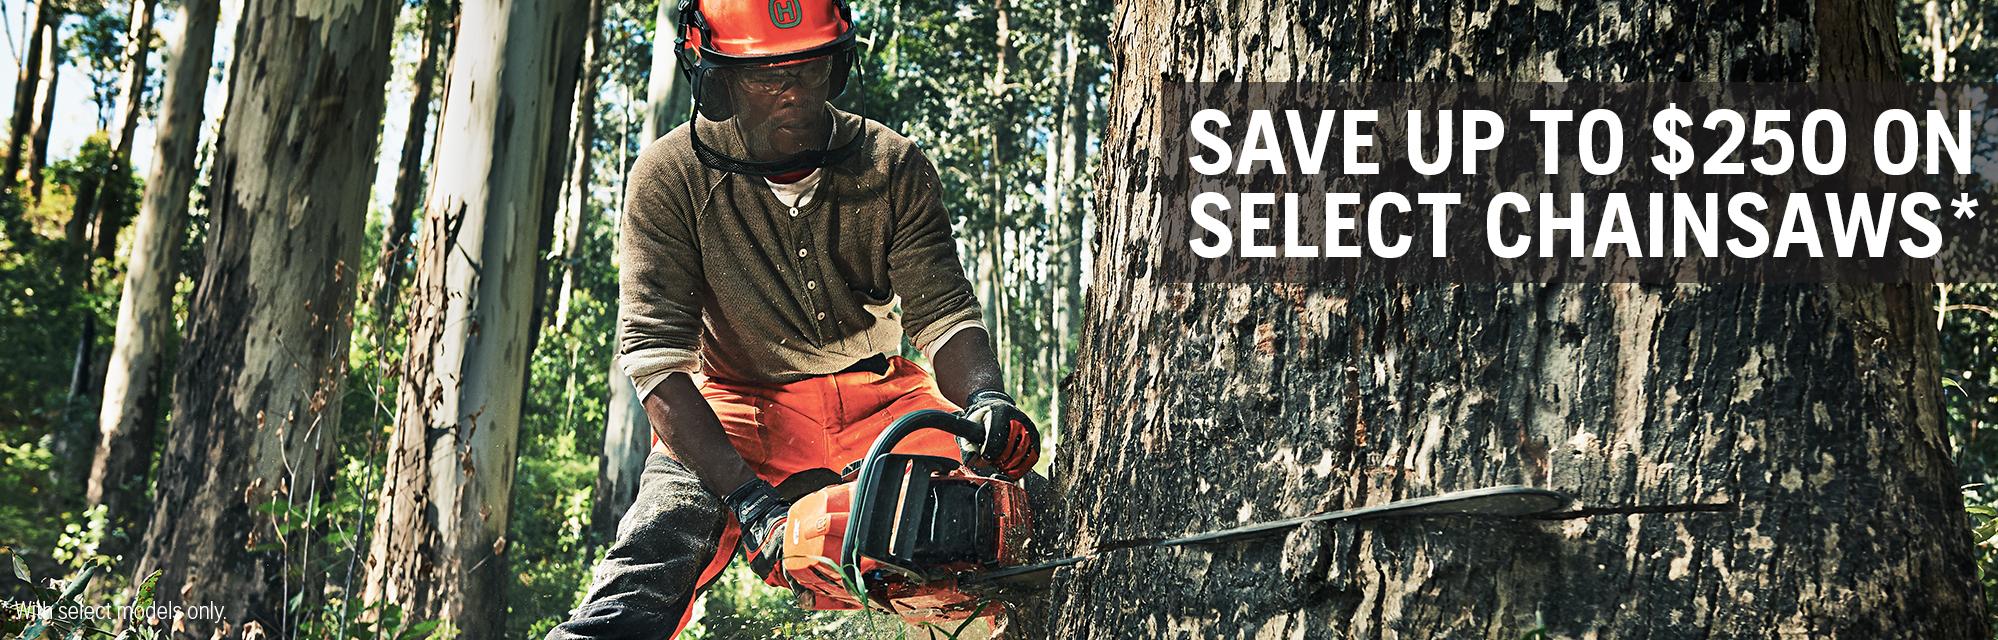 Autumn 2021 - Save 250 on Chainsaws